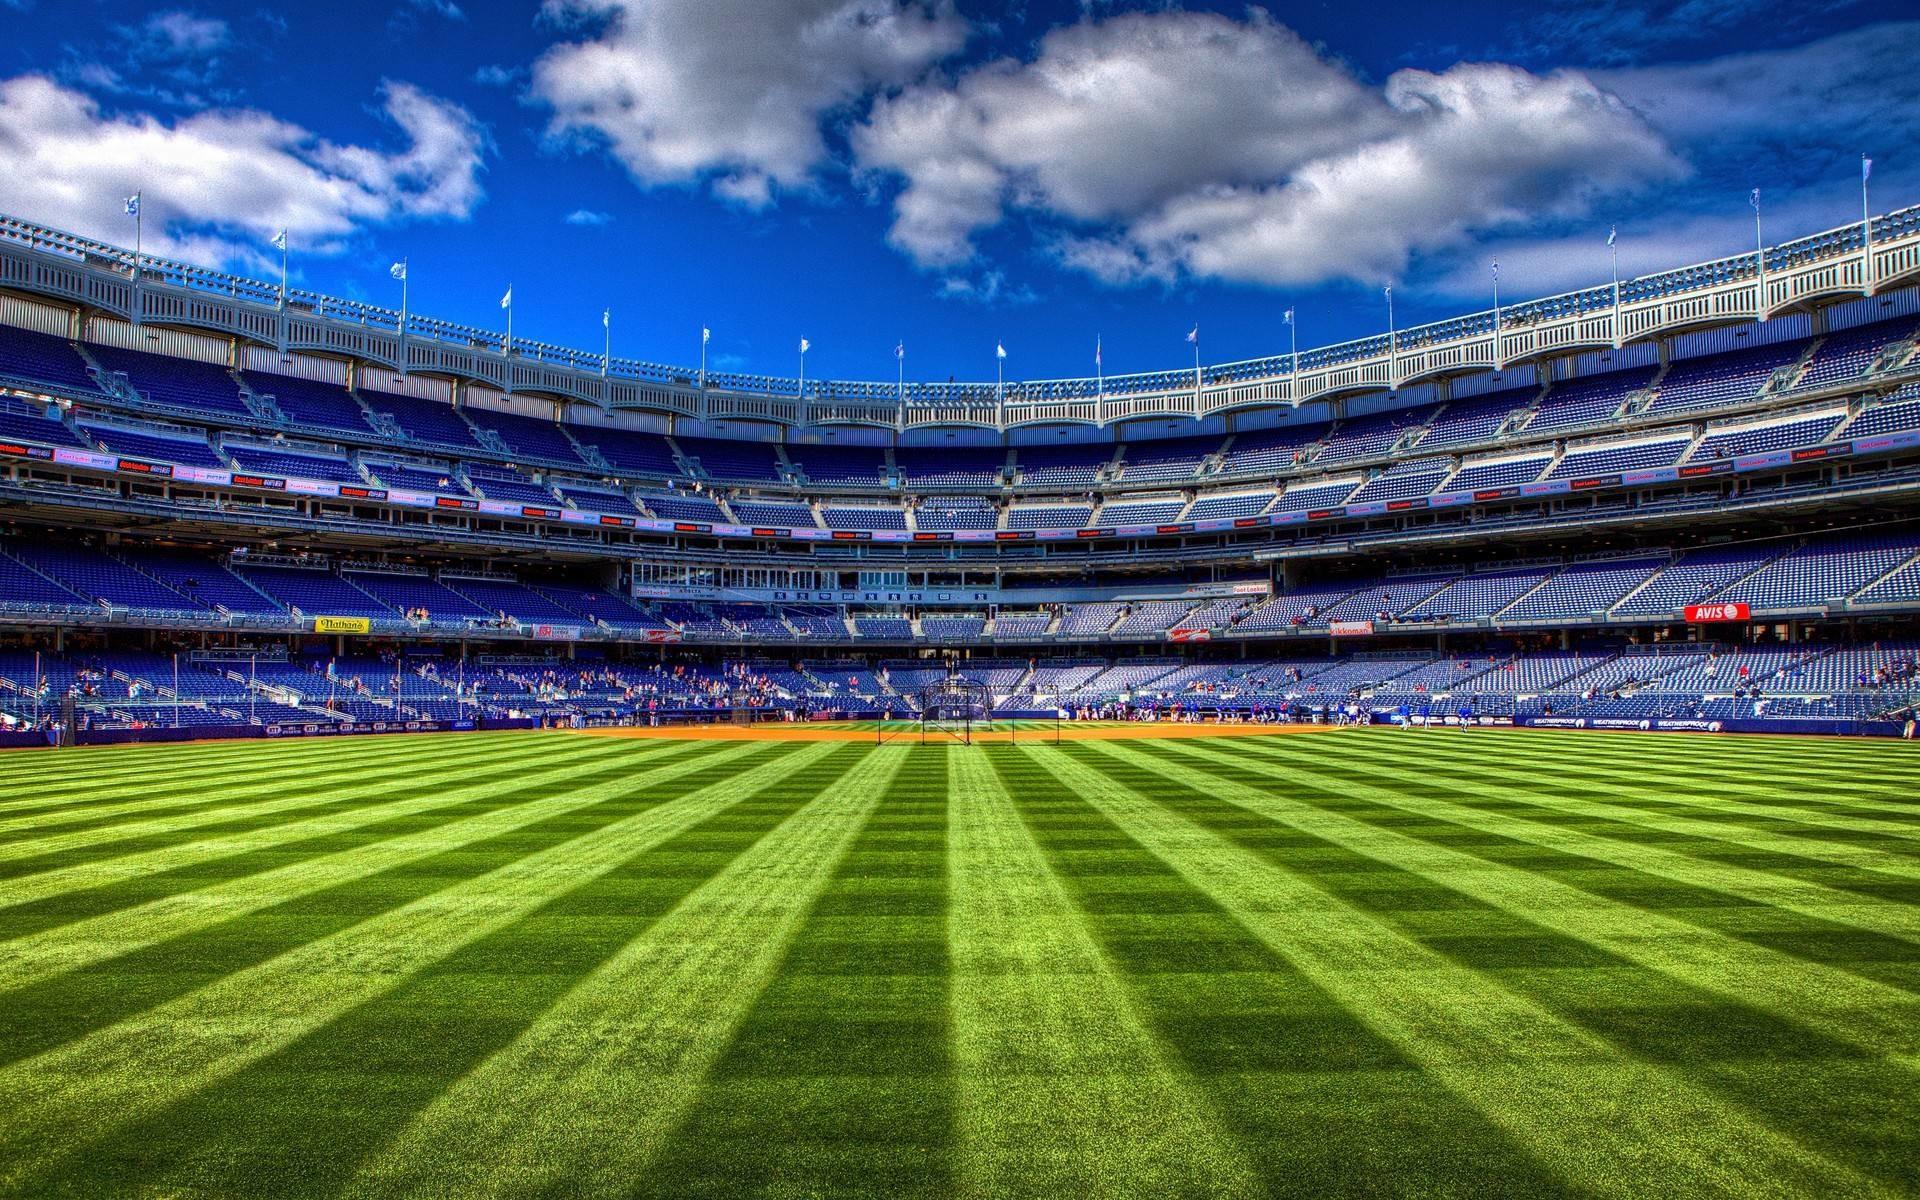 Yankee Stadium Wallpapers Wallpaper | HD Wallpapers | Pinterest | Hd  wallpaper, Yankee stadium and Wallpaper